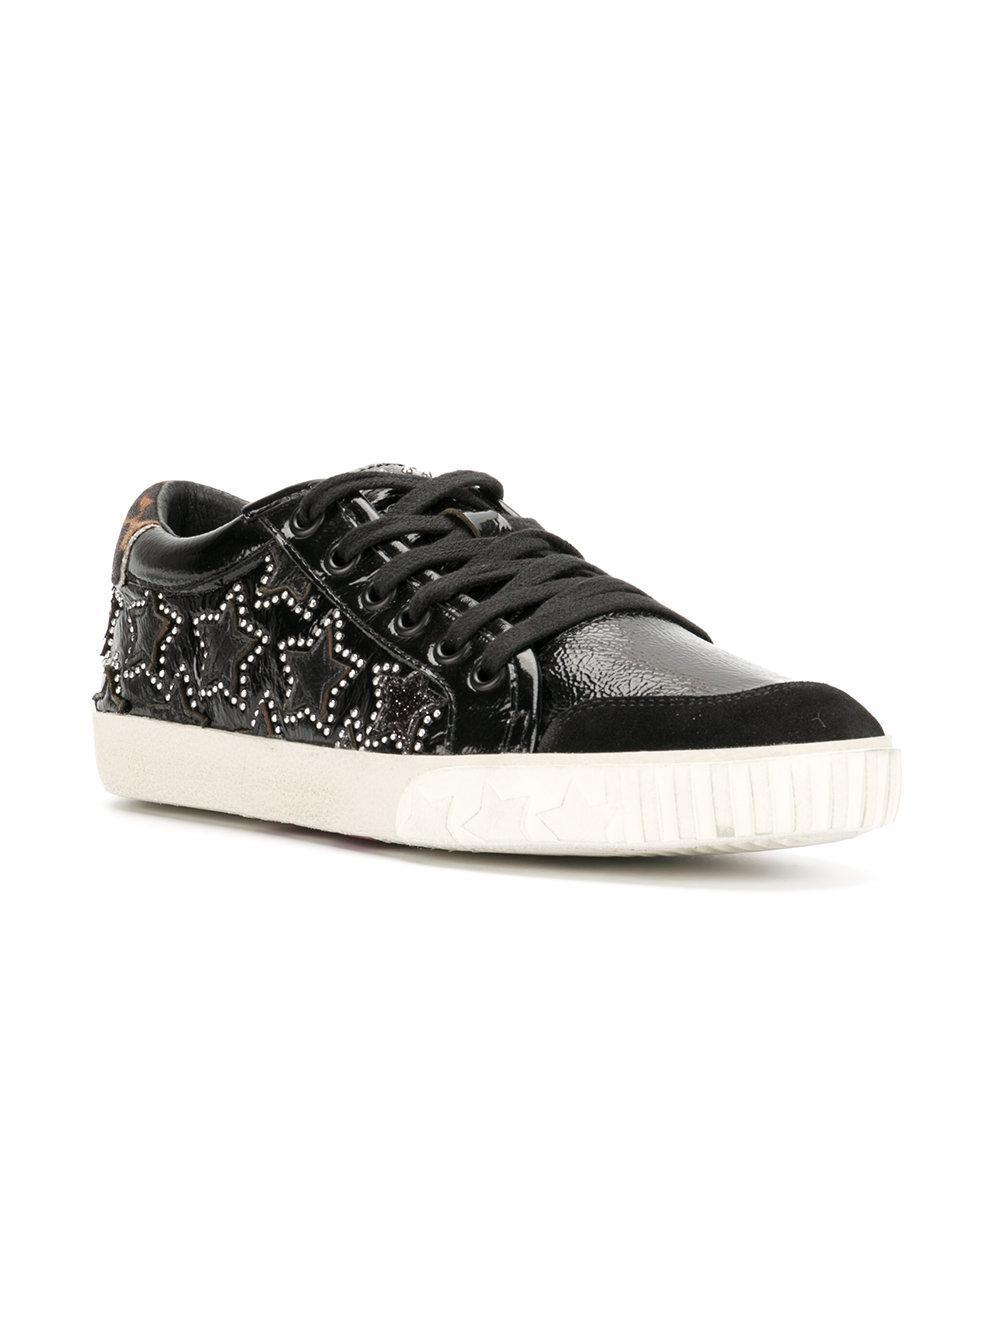 Ash Majetic lace-up sneakers buy cheap fake cheap price cost KHThnRXU